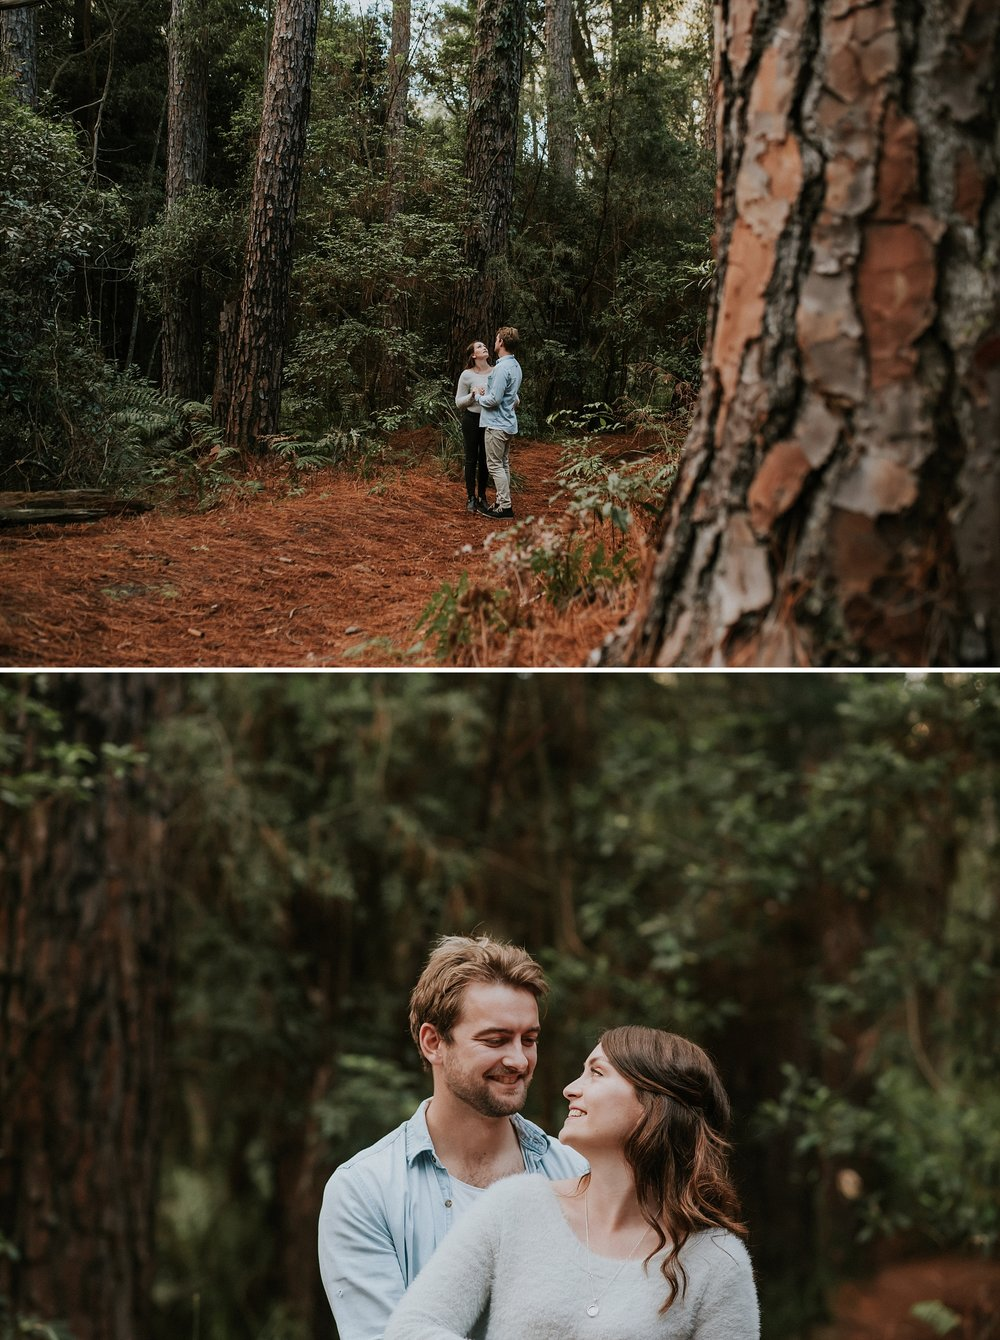 PINES-FOREST-PARK-ENGAGEMENT-MAT-AMY-4_BLOG.jpg